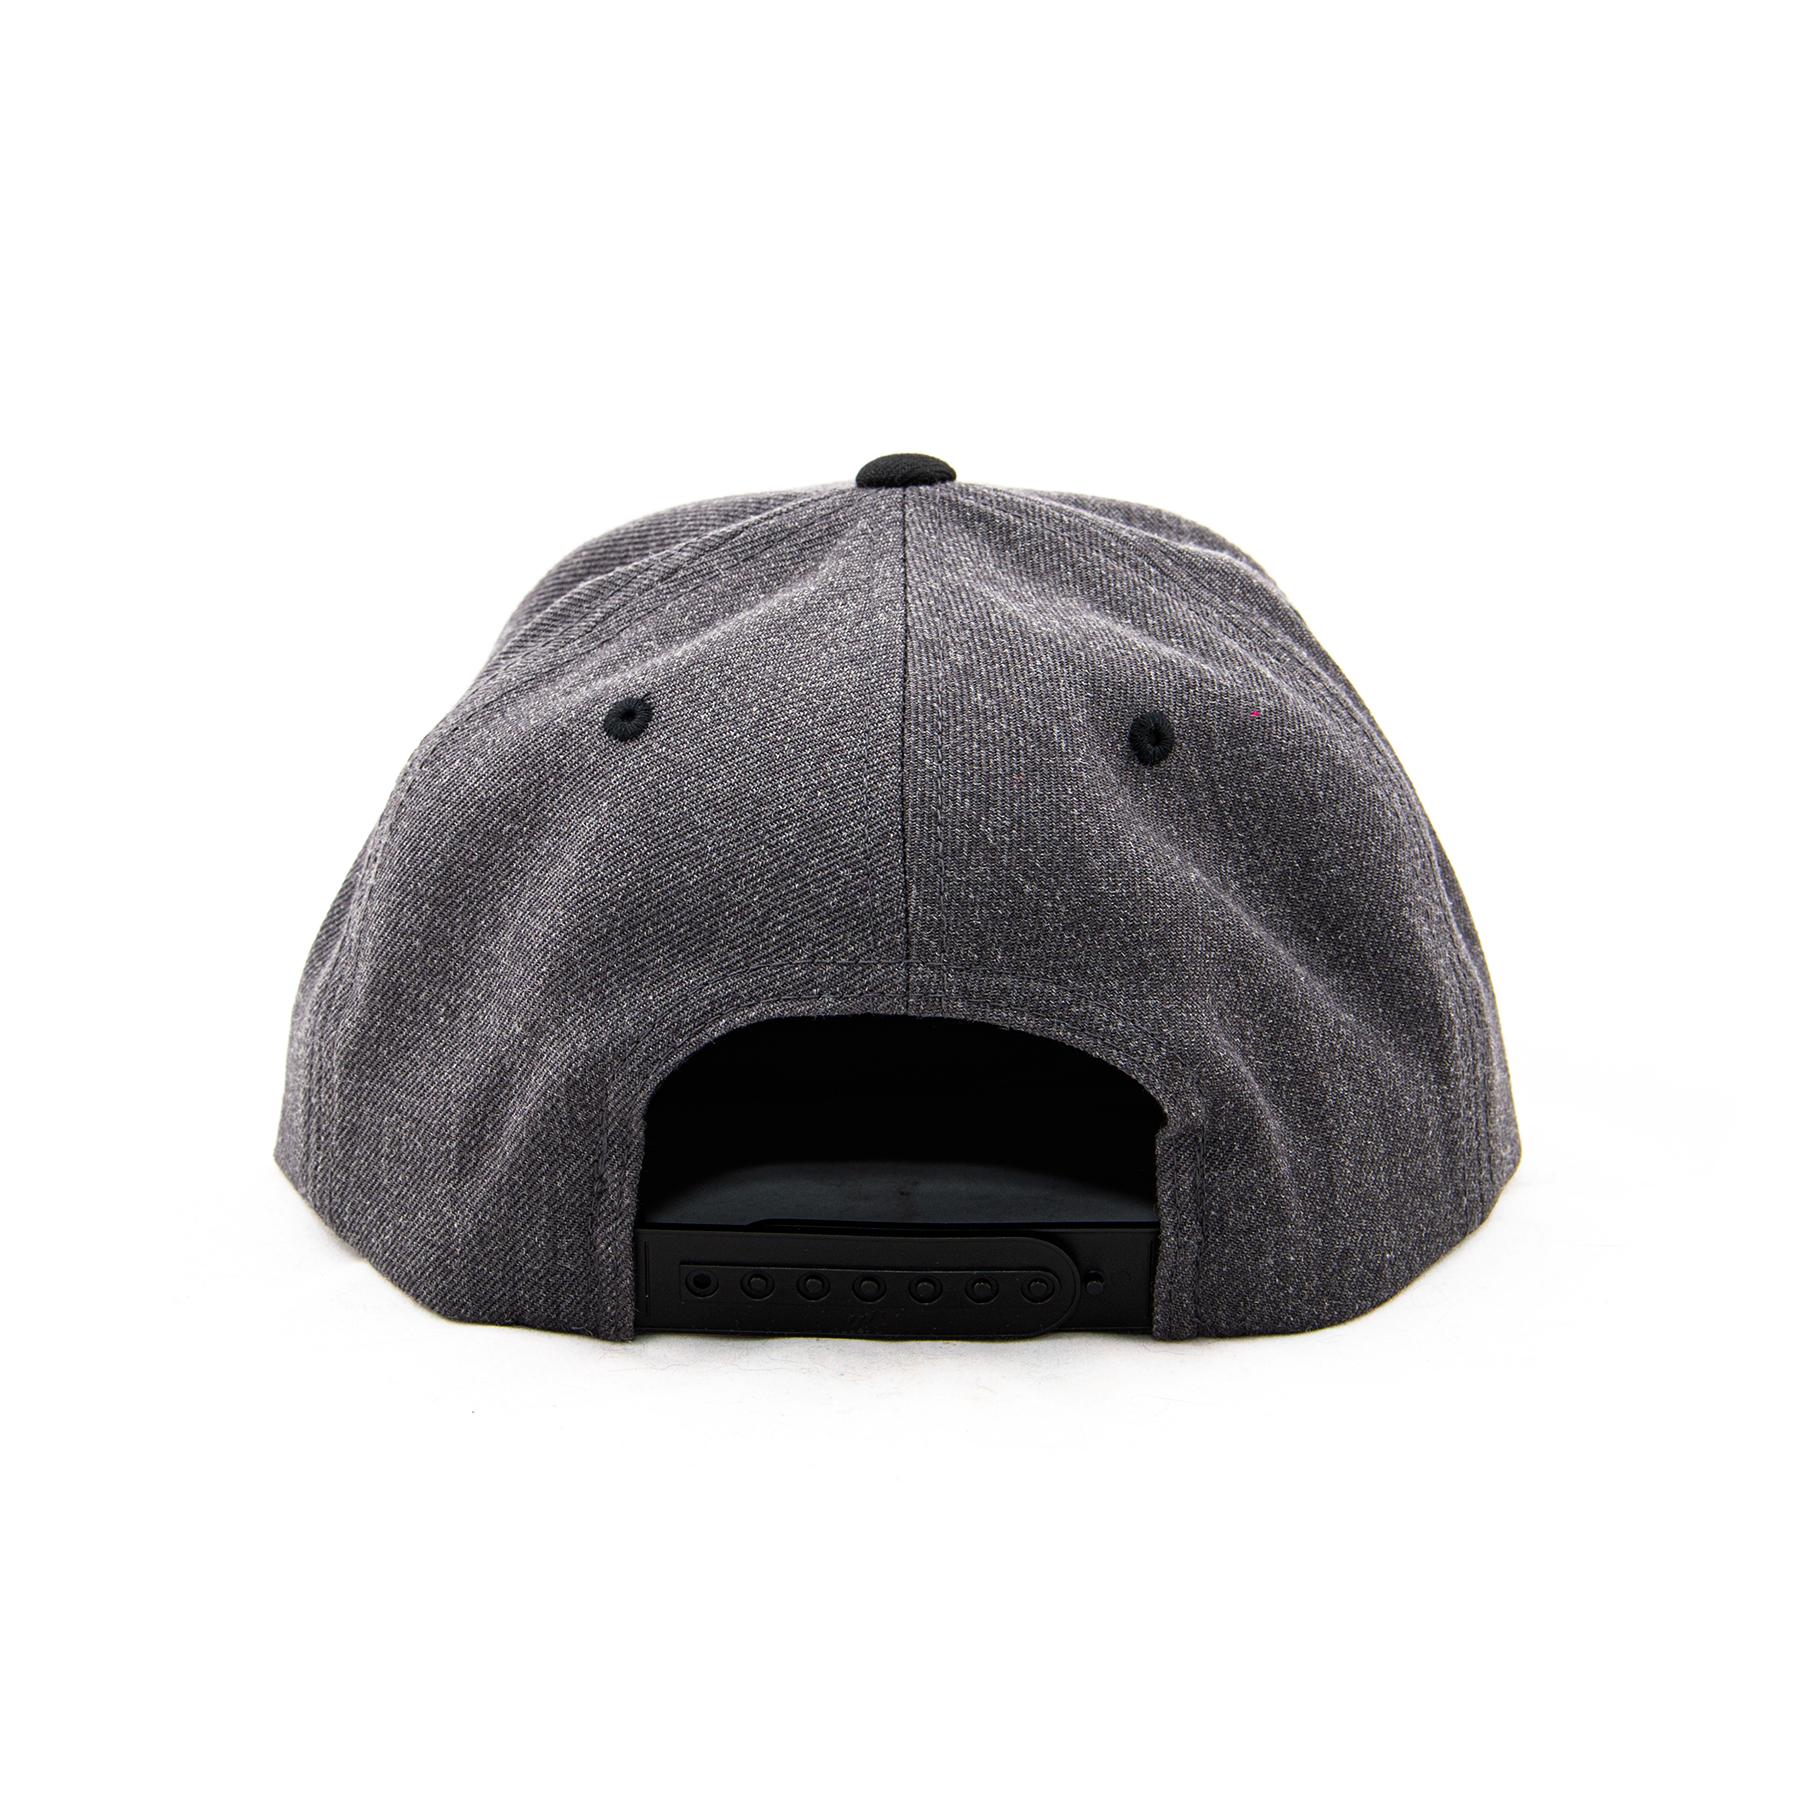 gray hat image back